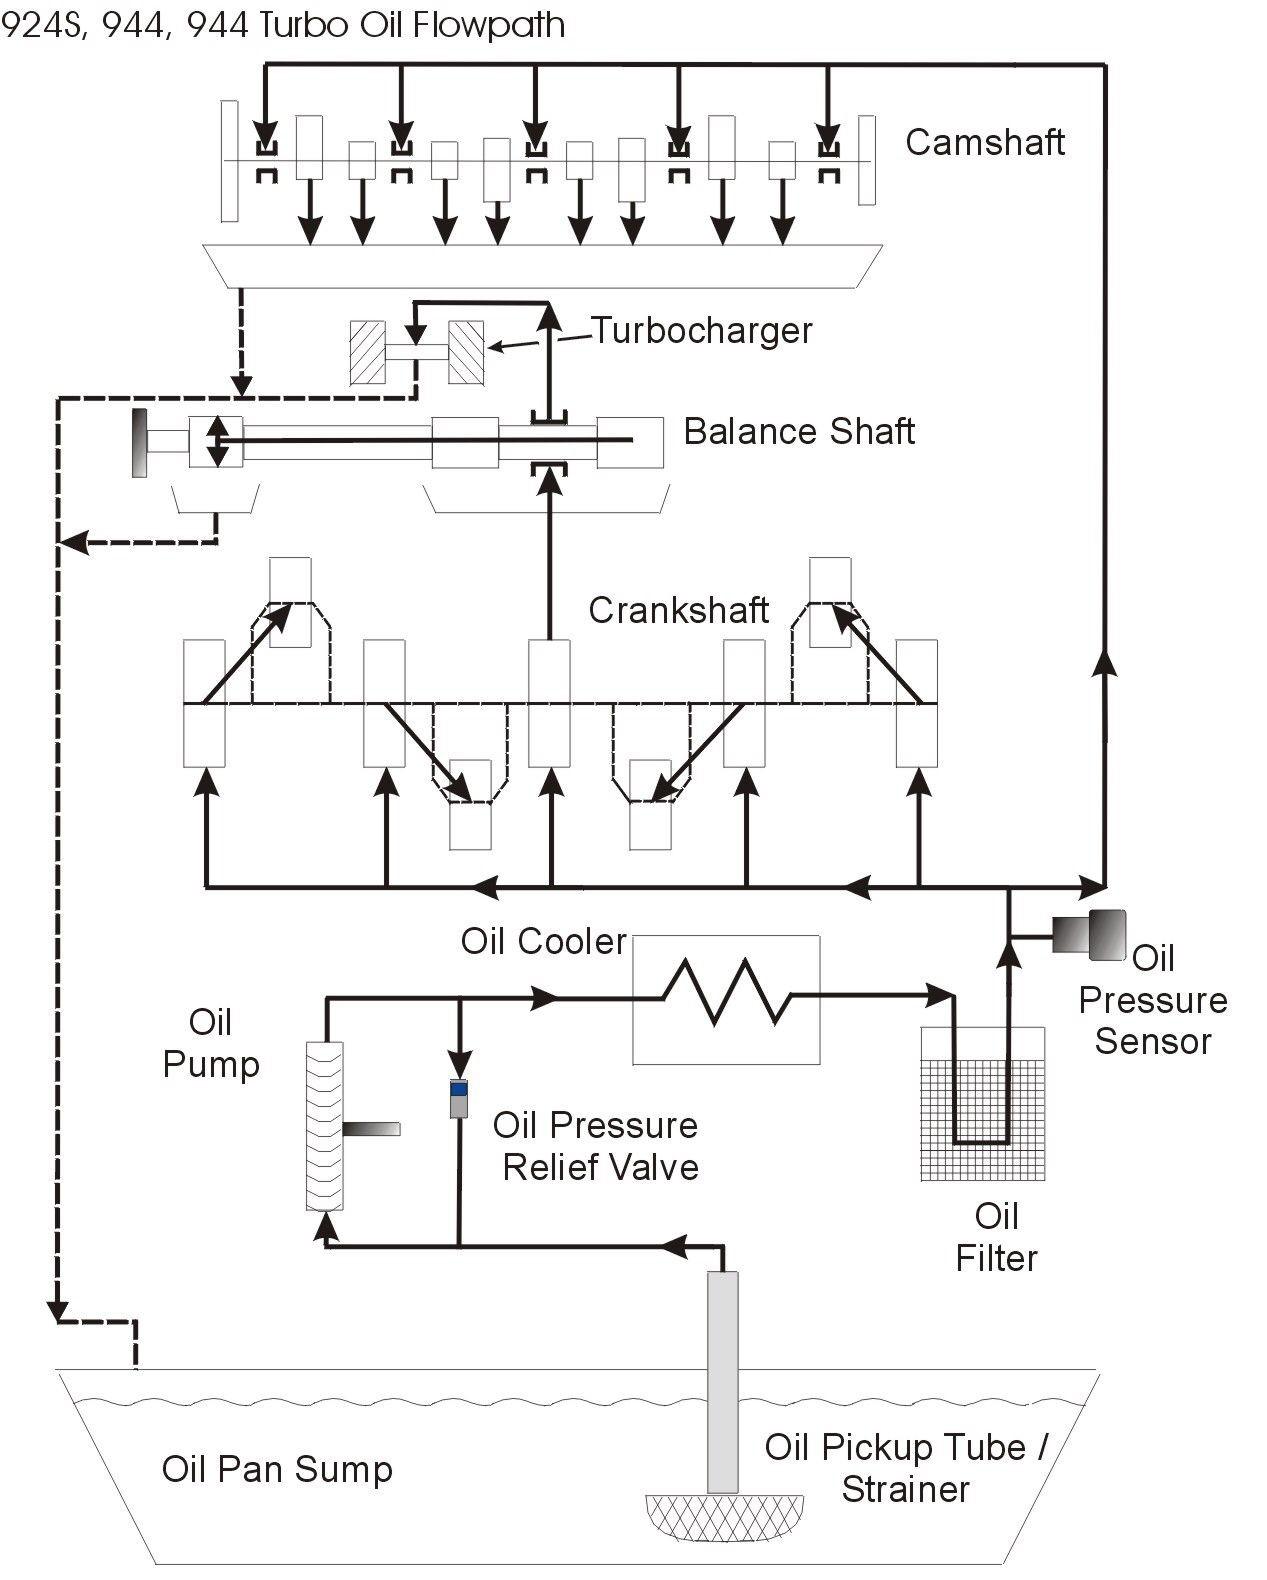 Diagram Of A Turbocharger Porsche 944 Engine Oil Flow Porsche Transaxles Of Diagram Of A Turbocharger